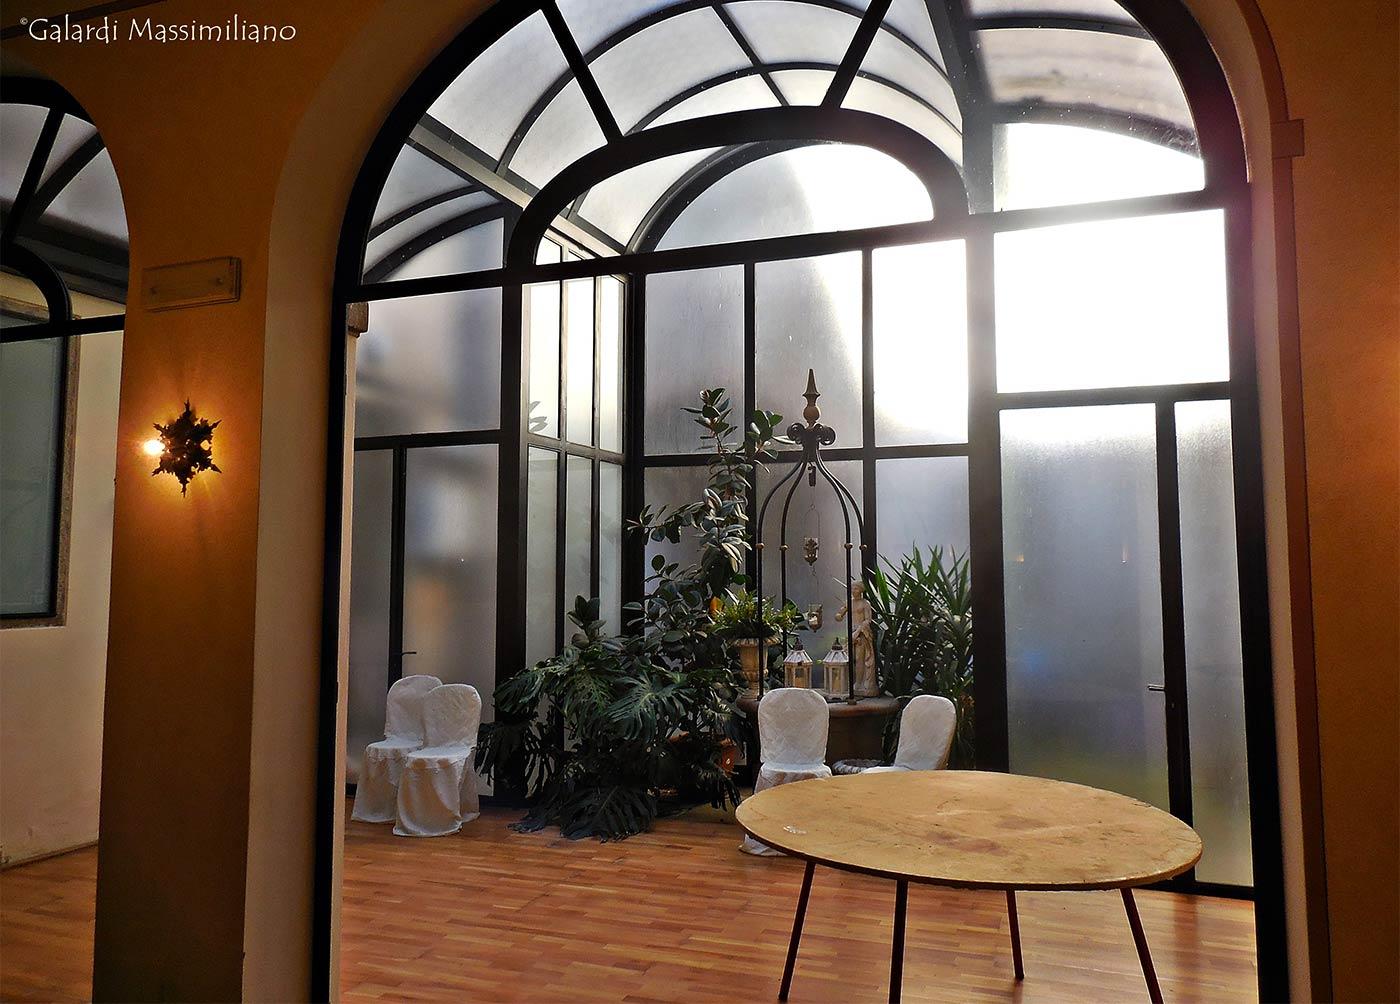 villa-il-palagio-massimiliano-galardi-2